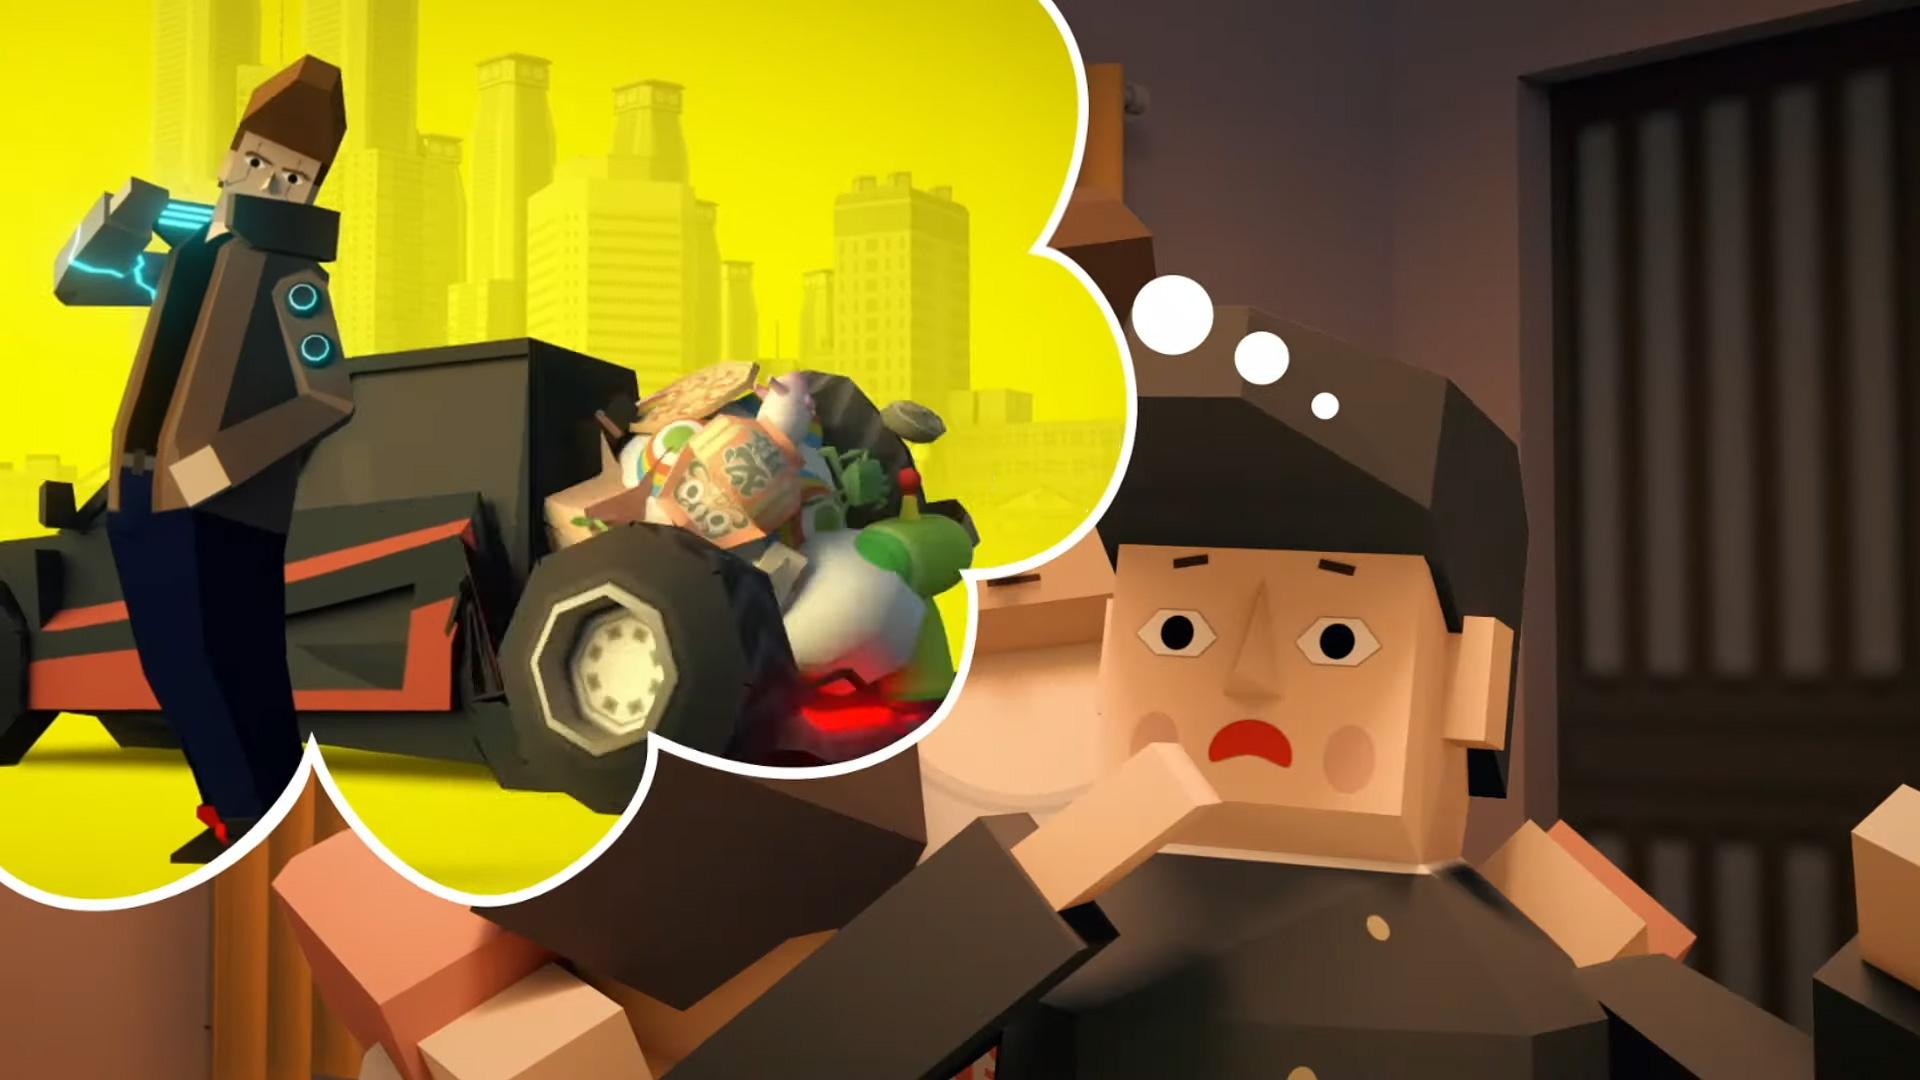 At last, Katamari Damacy Reroll is playable on PS4 and Xbox One screenshot